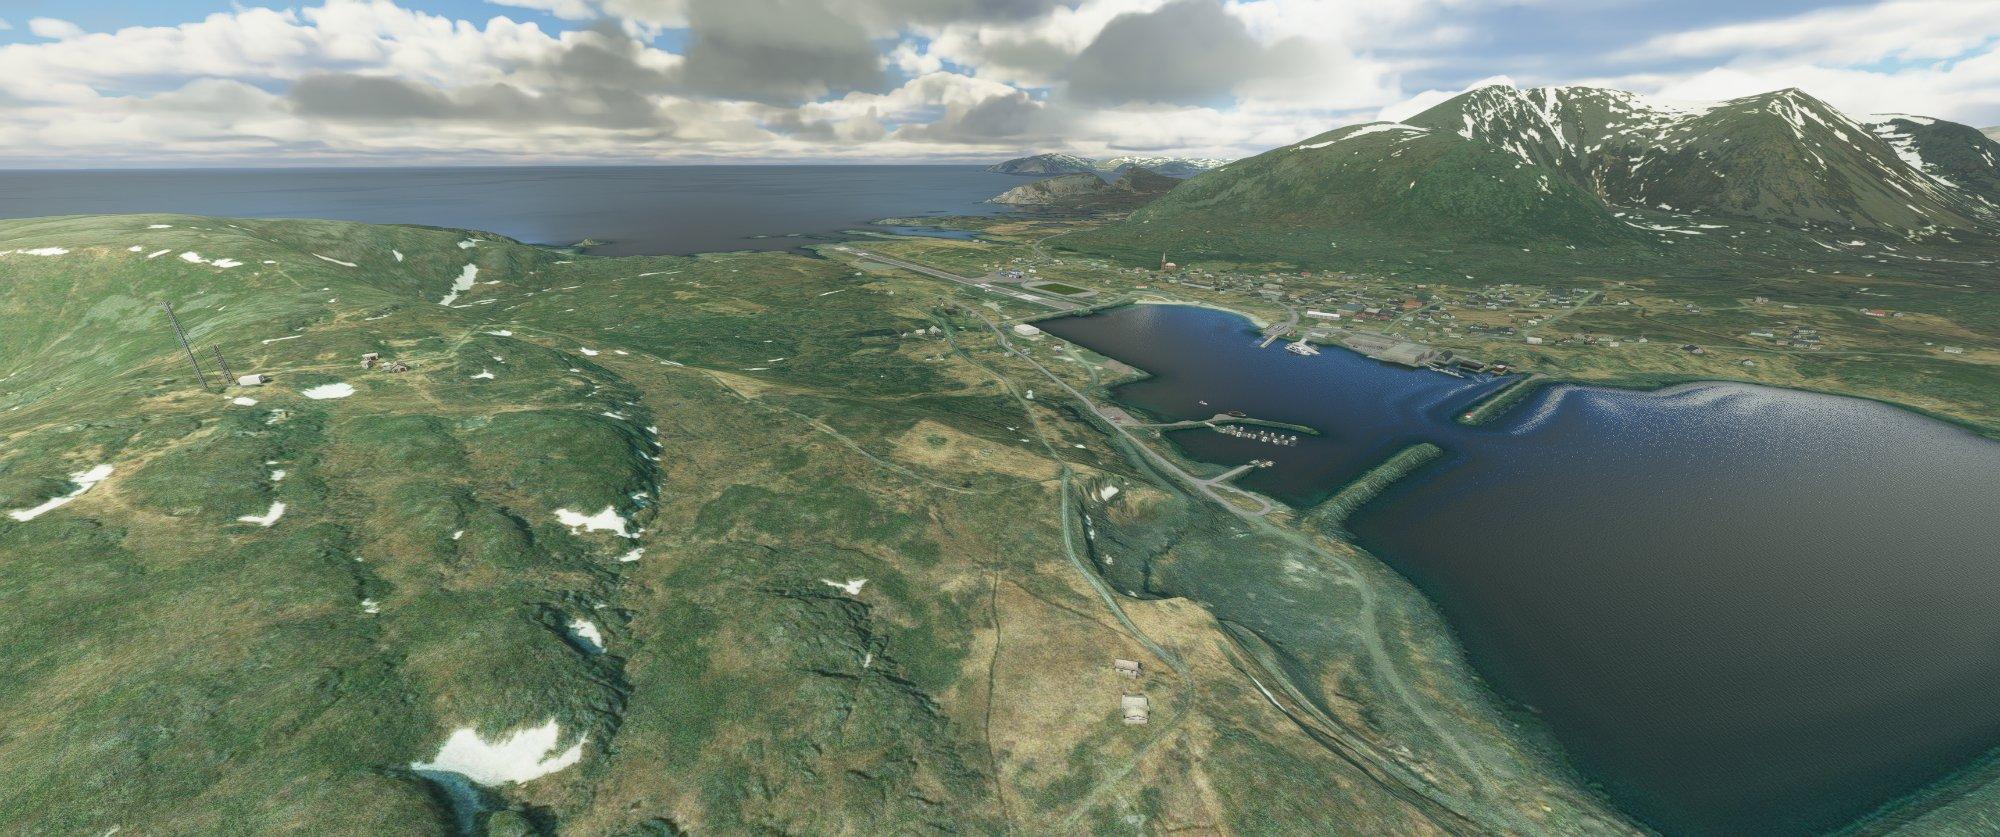 Microsoft Flight Simulator Screenshot 2021.06.21 - 23.00.21.54.jpg